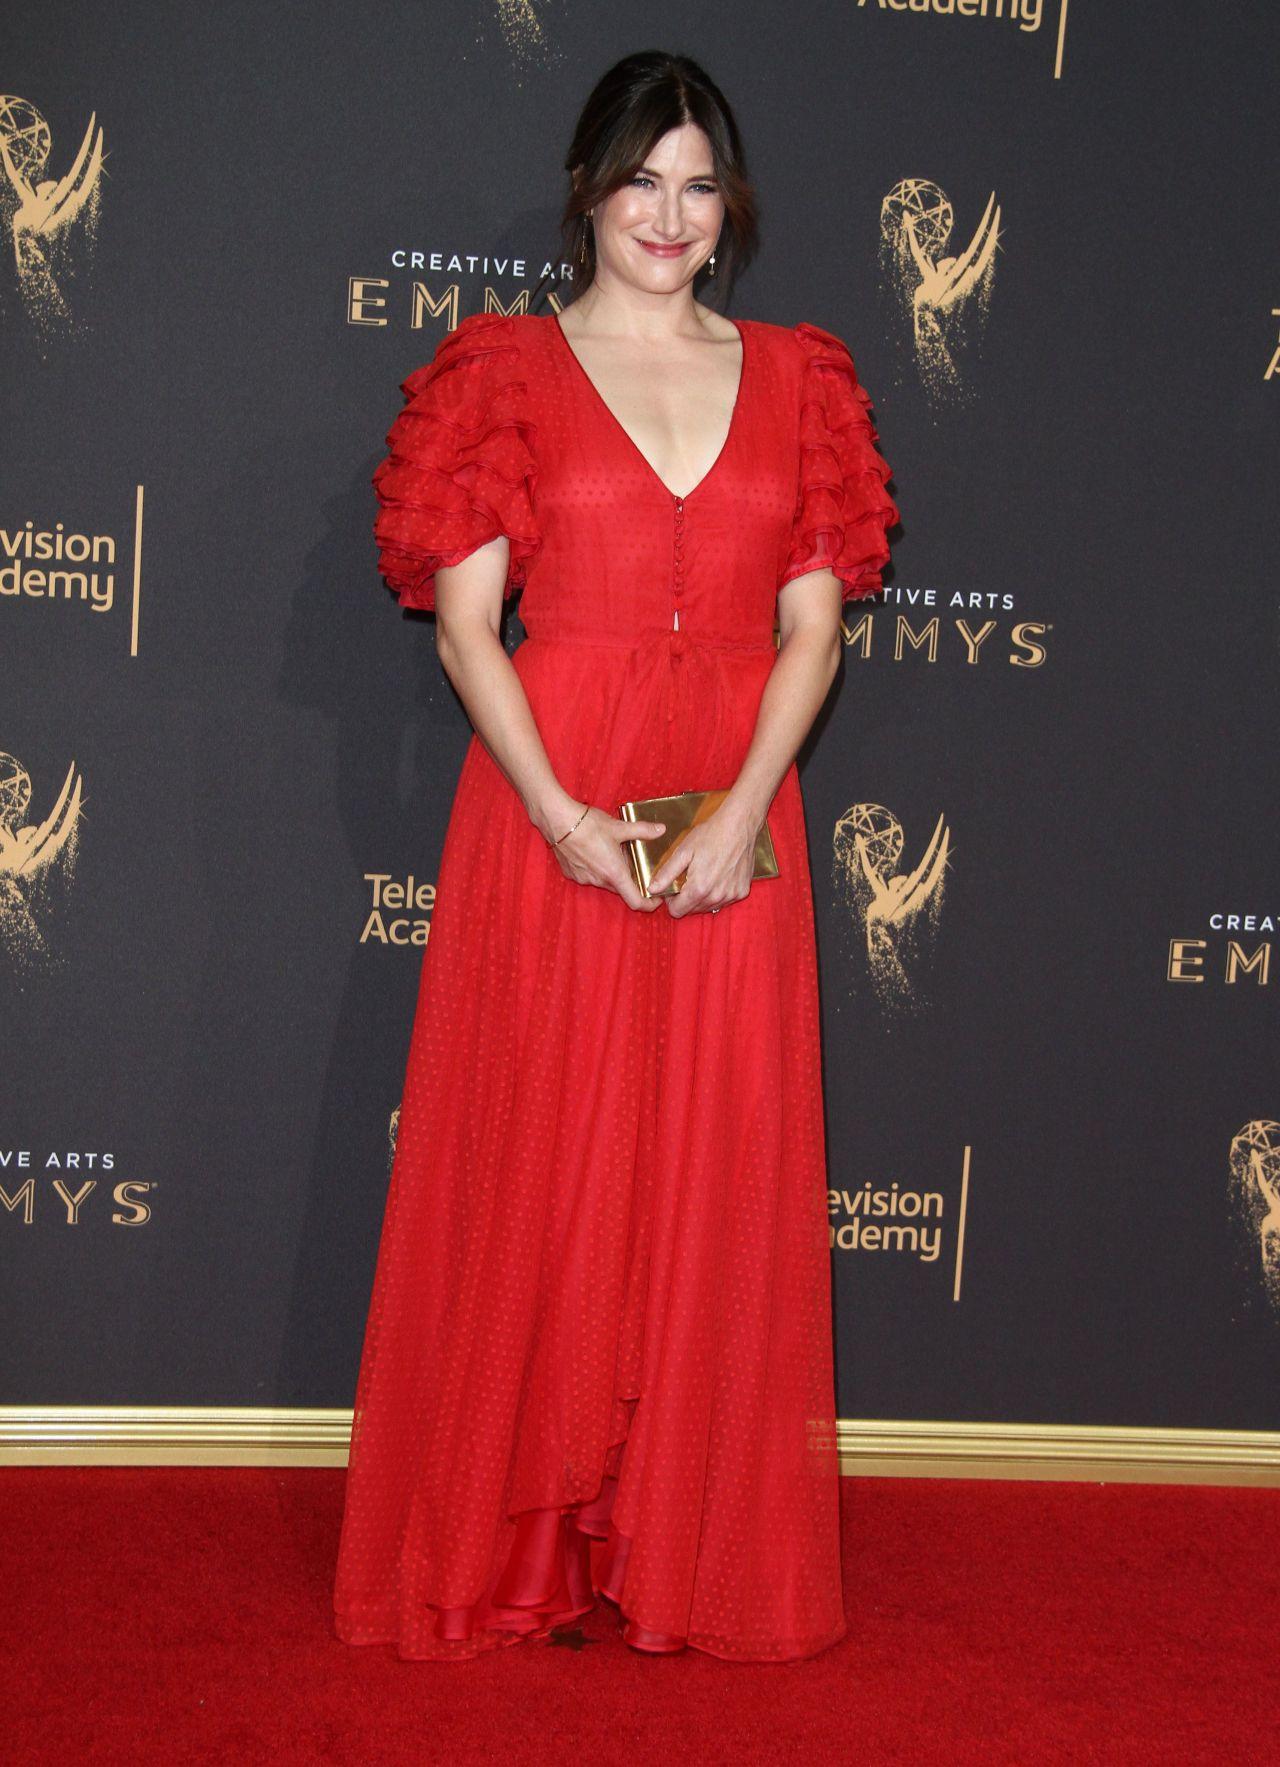 Kathryn Hahn Creative Arts Emmy Awards In Los Angeles 09